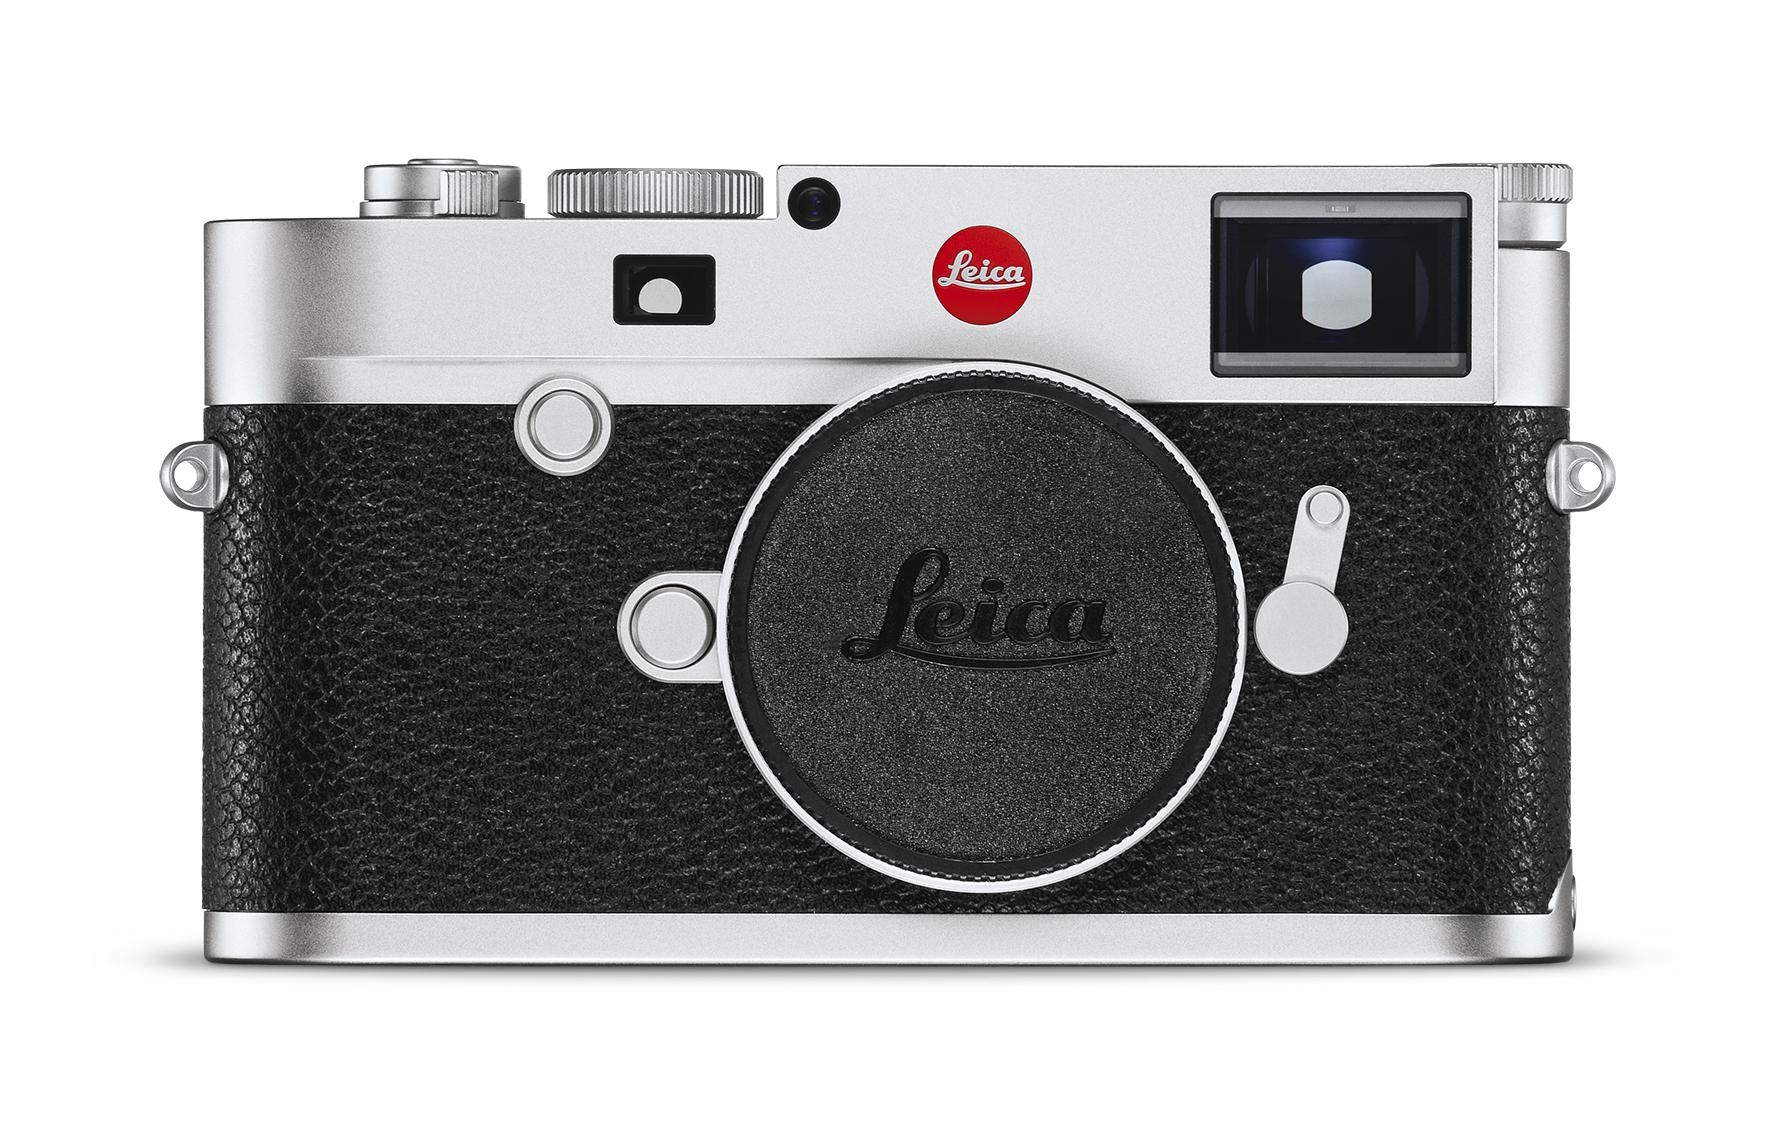 Leica Cl Entfernungsmesser Justieren : Leica m10 silbern verchromt m digital system